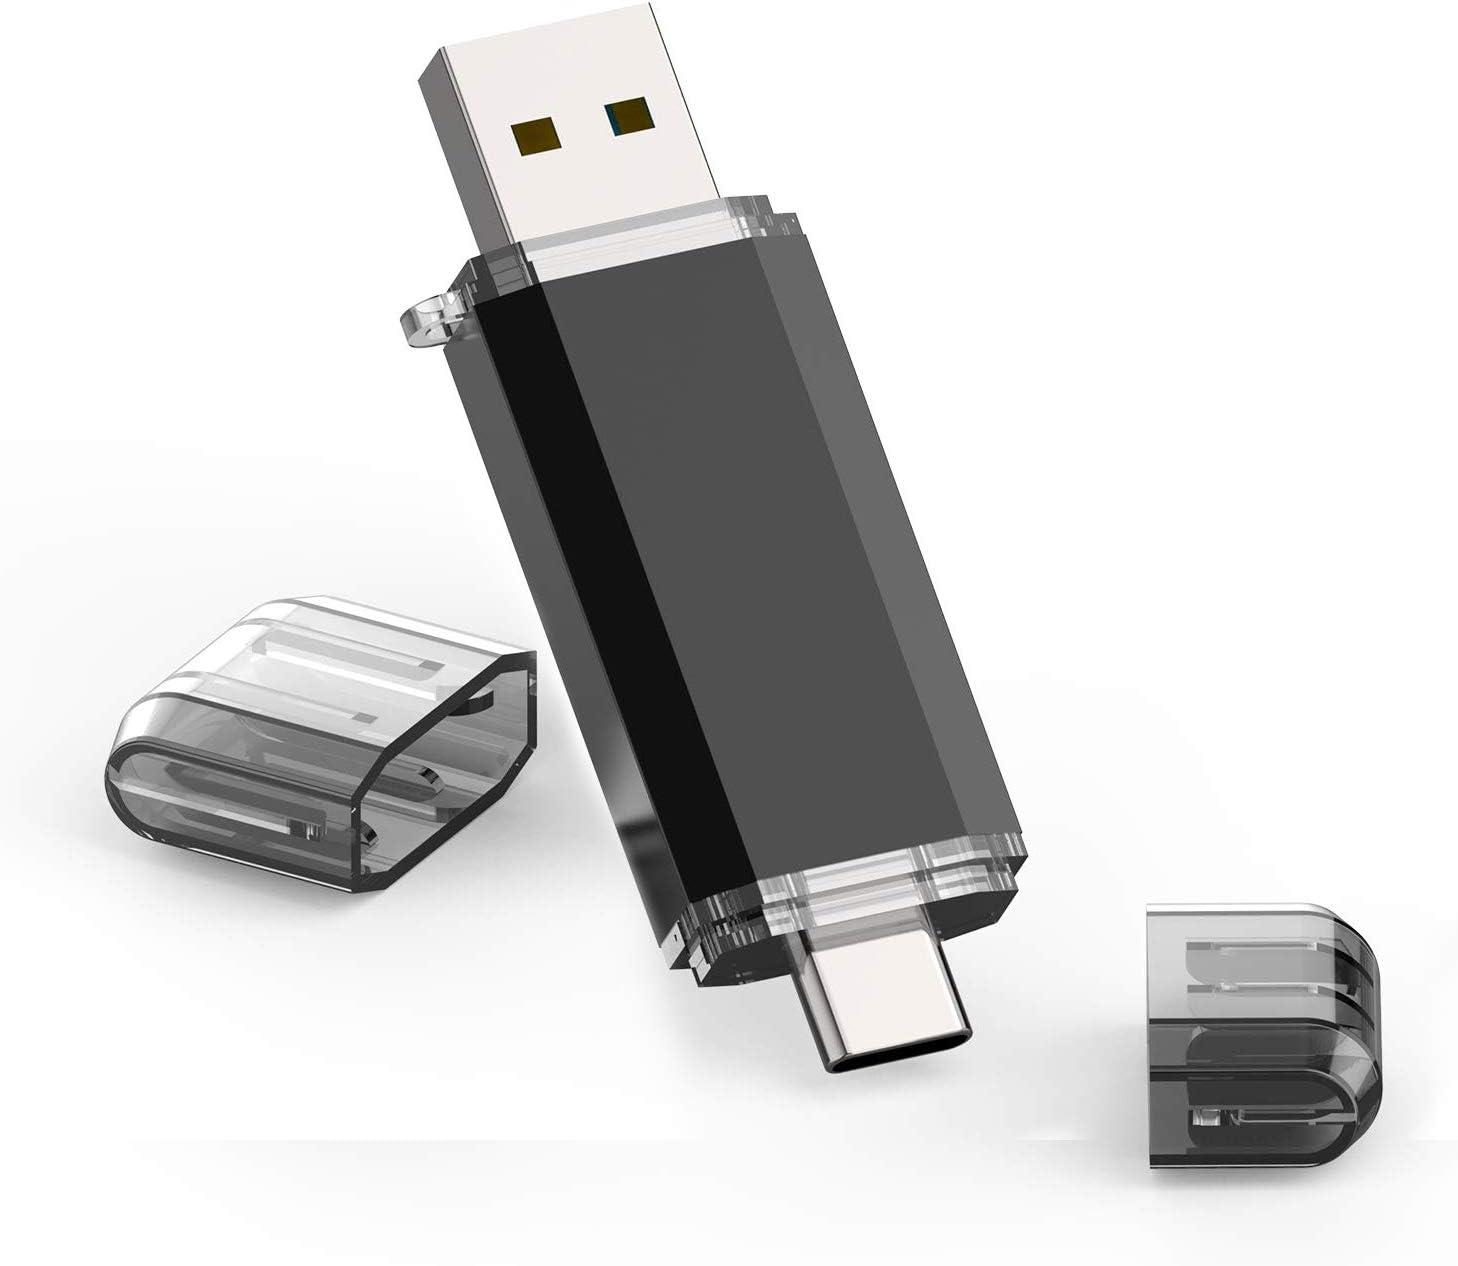 Color : Black External Storage USB Flash Drives 2 in 1 Pen Style USB Flash Disk Black USB Flash Drives 2GB